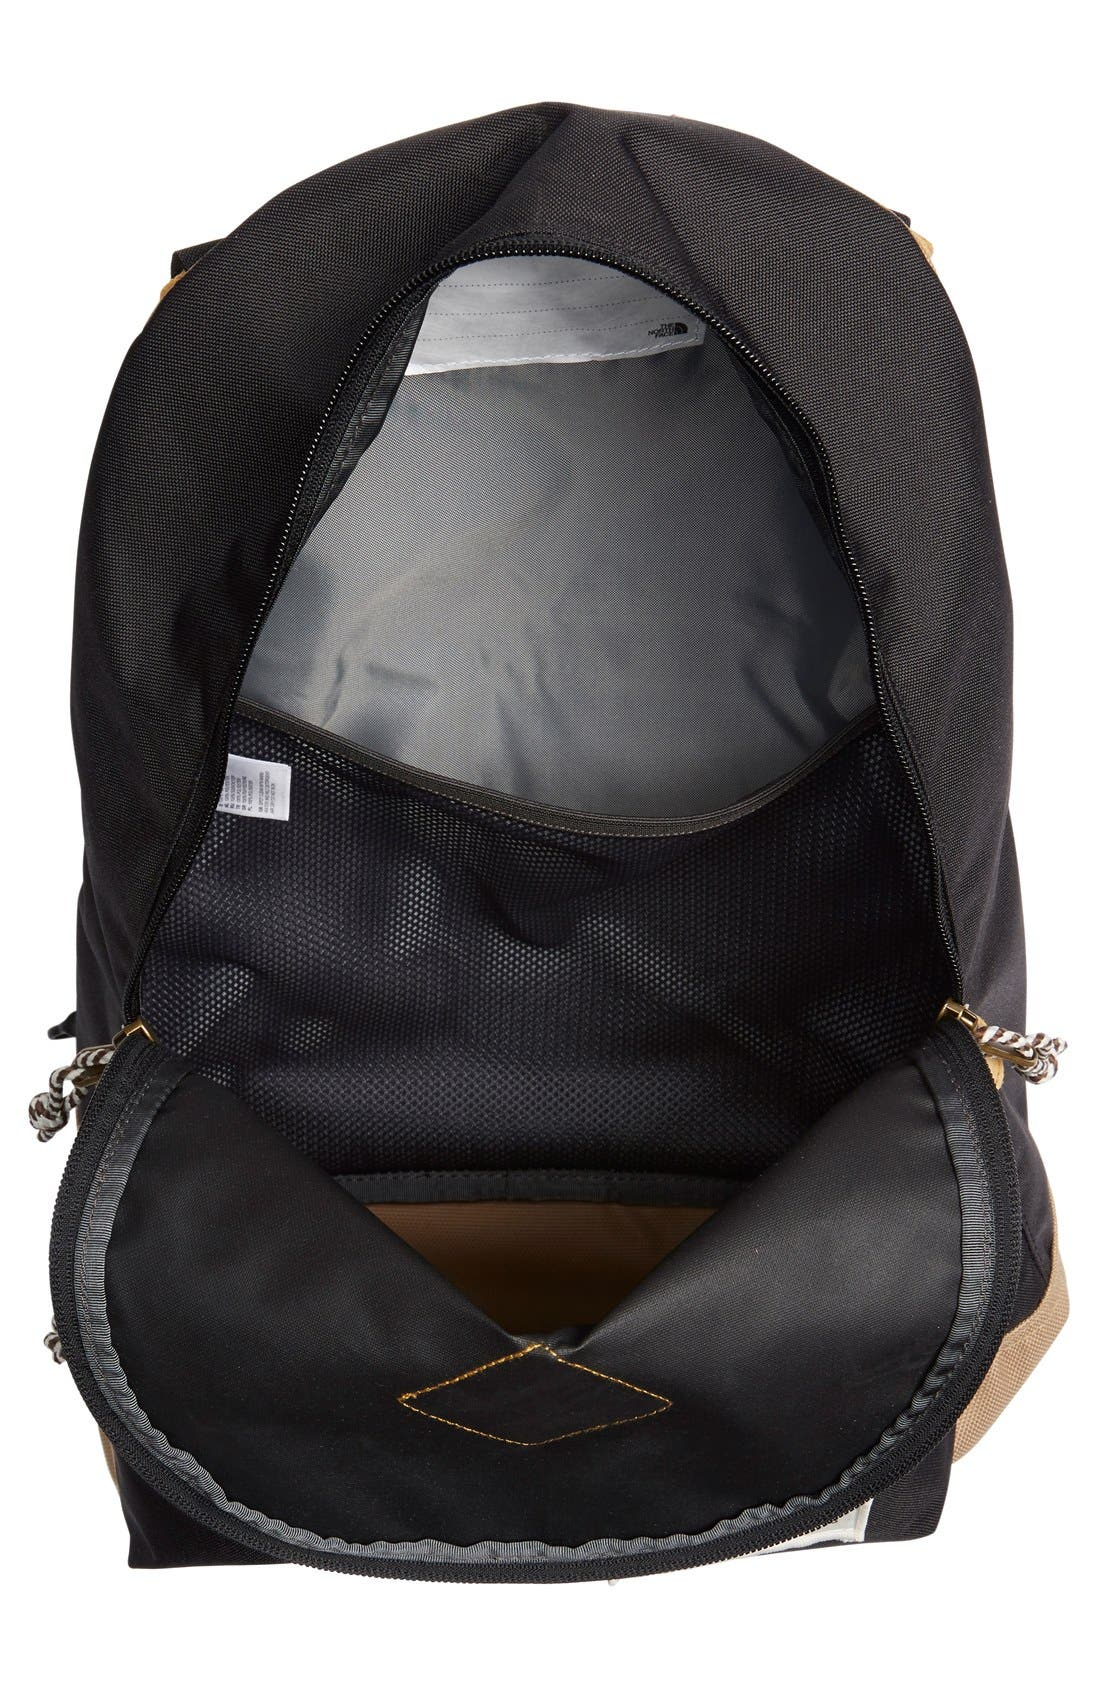 THE NORTH FACE,                             'Mini Berkeley' Backpack,                             Alternate thumbnail 4, color,                             001